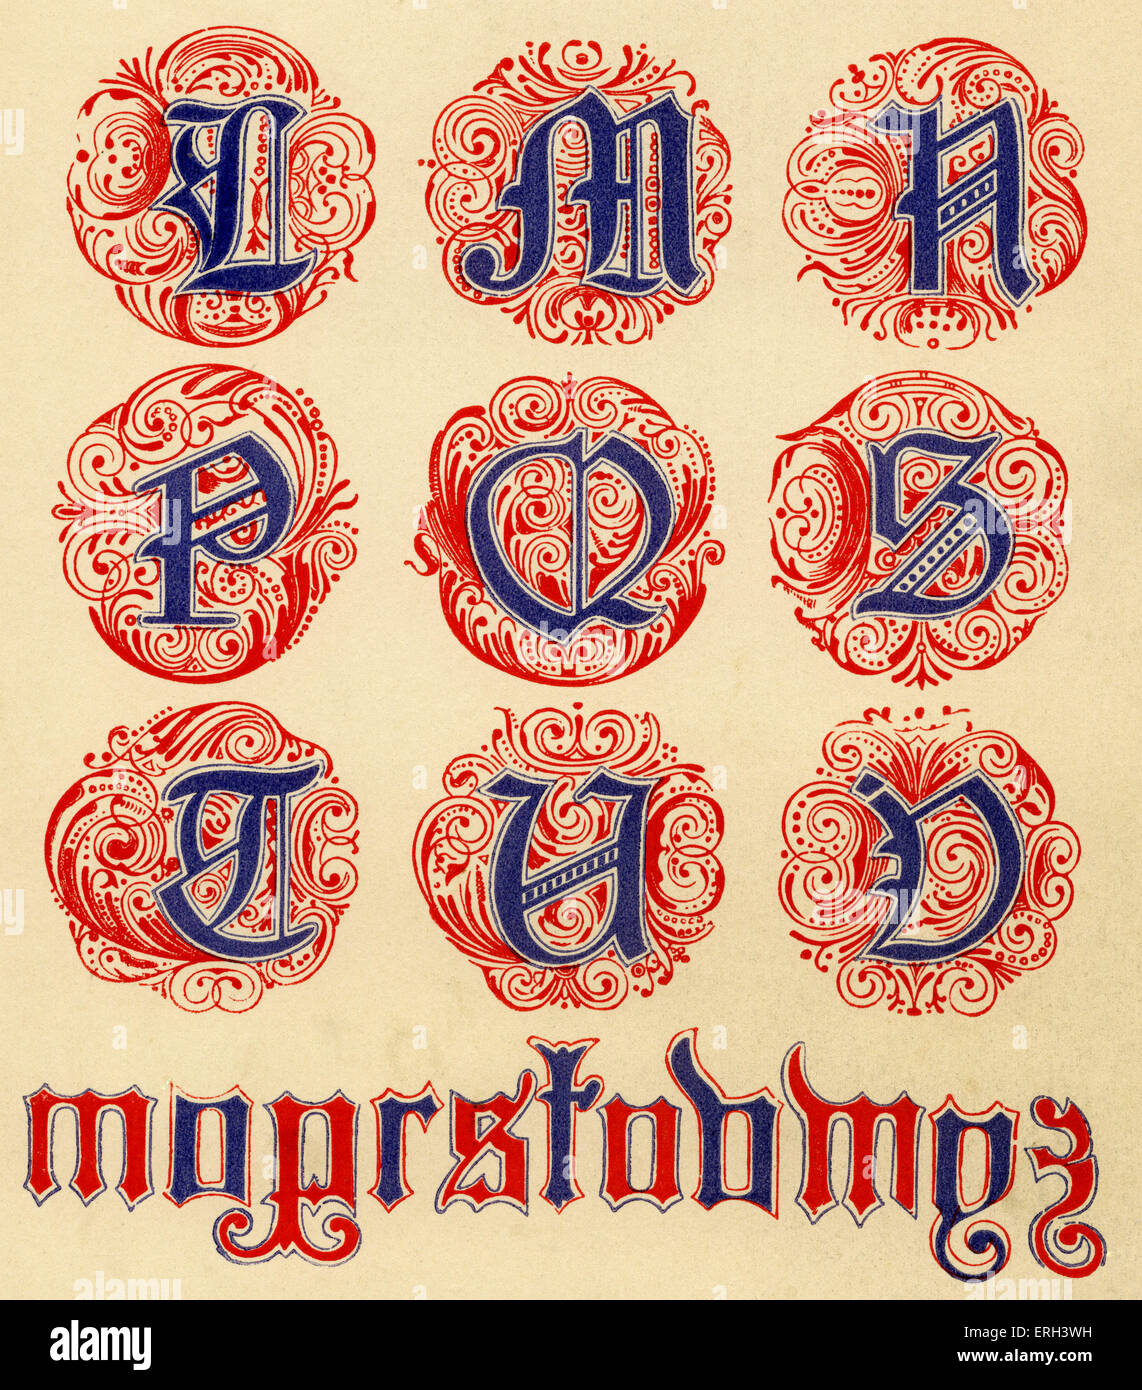 Red and blue illuminated alphabet. Fourteenth  century. (1886 source). - Stock Image